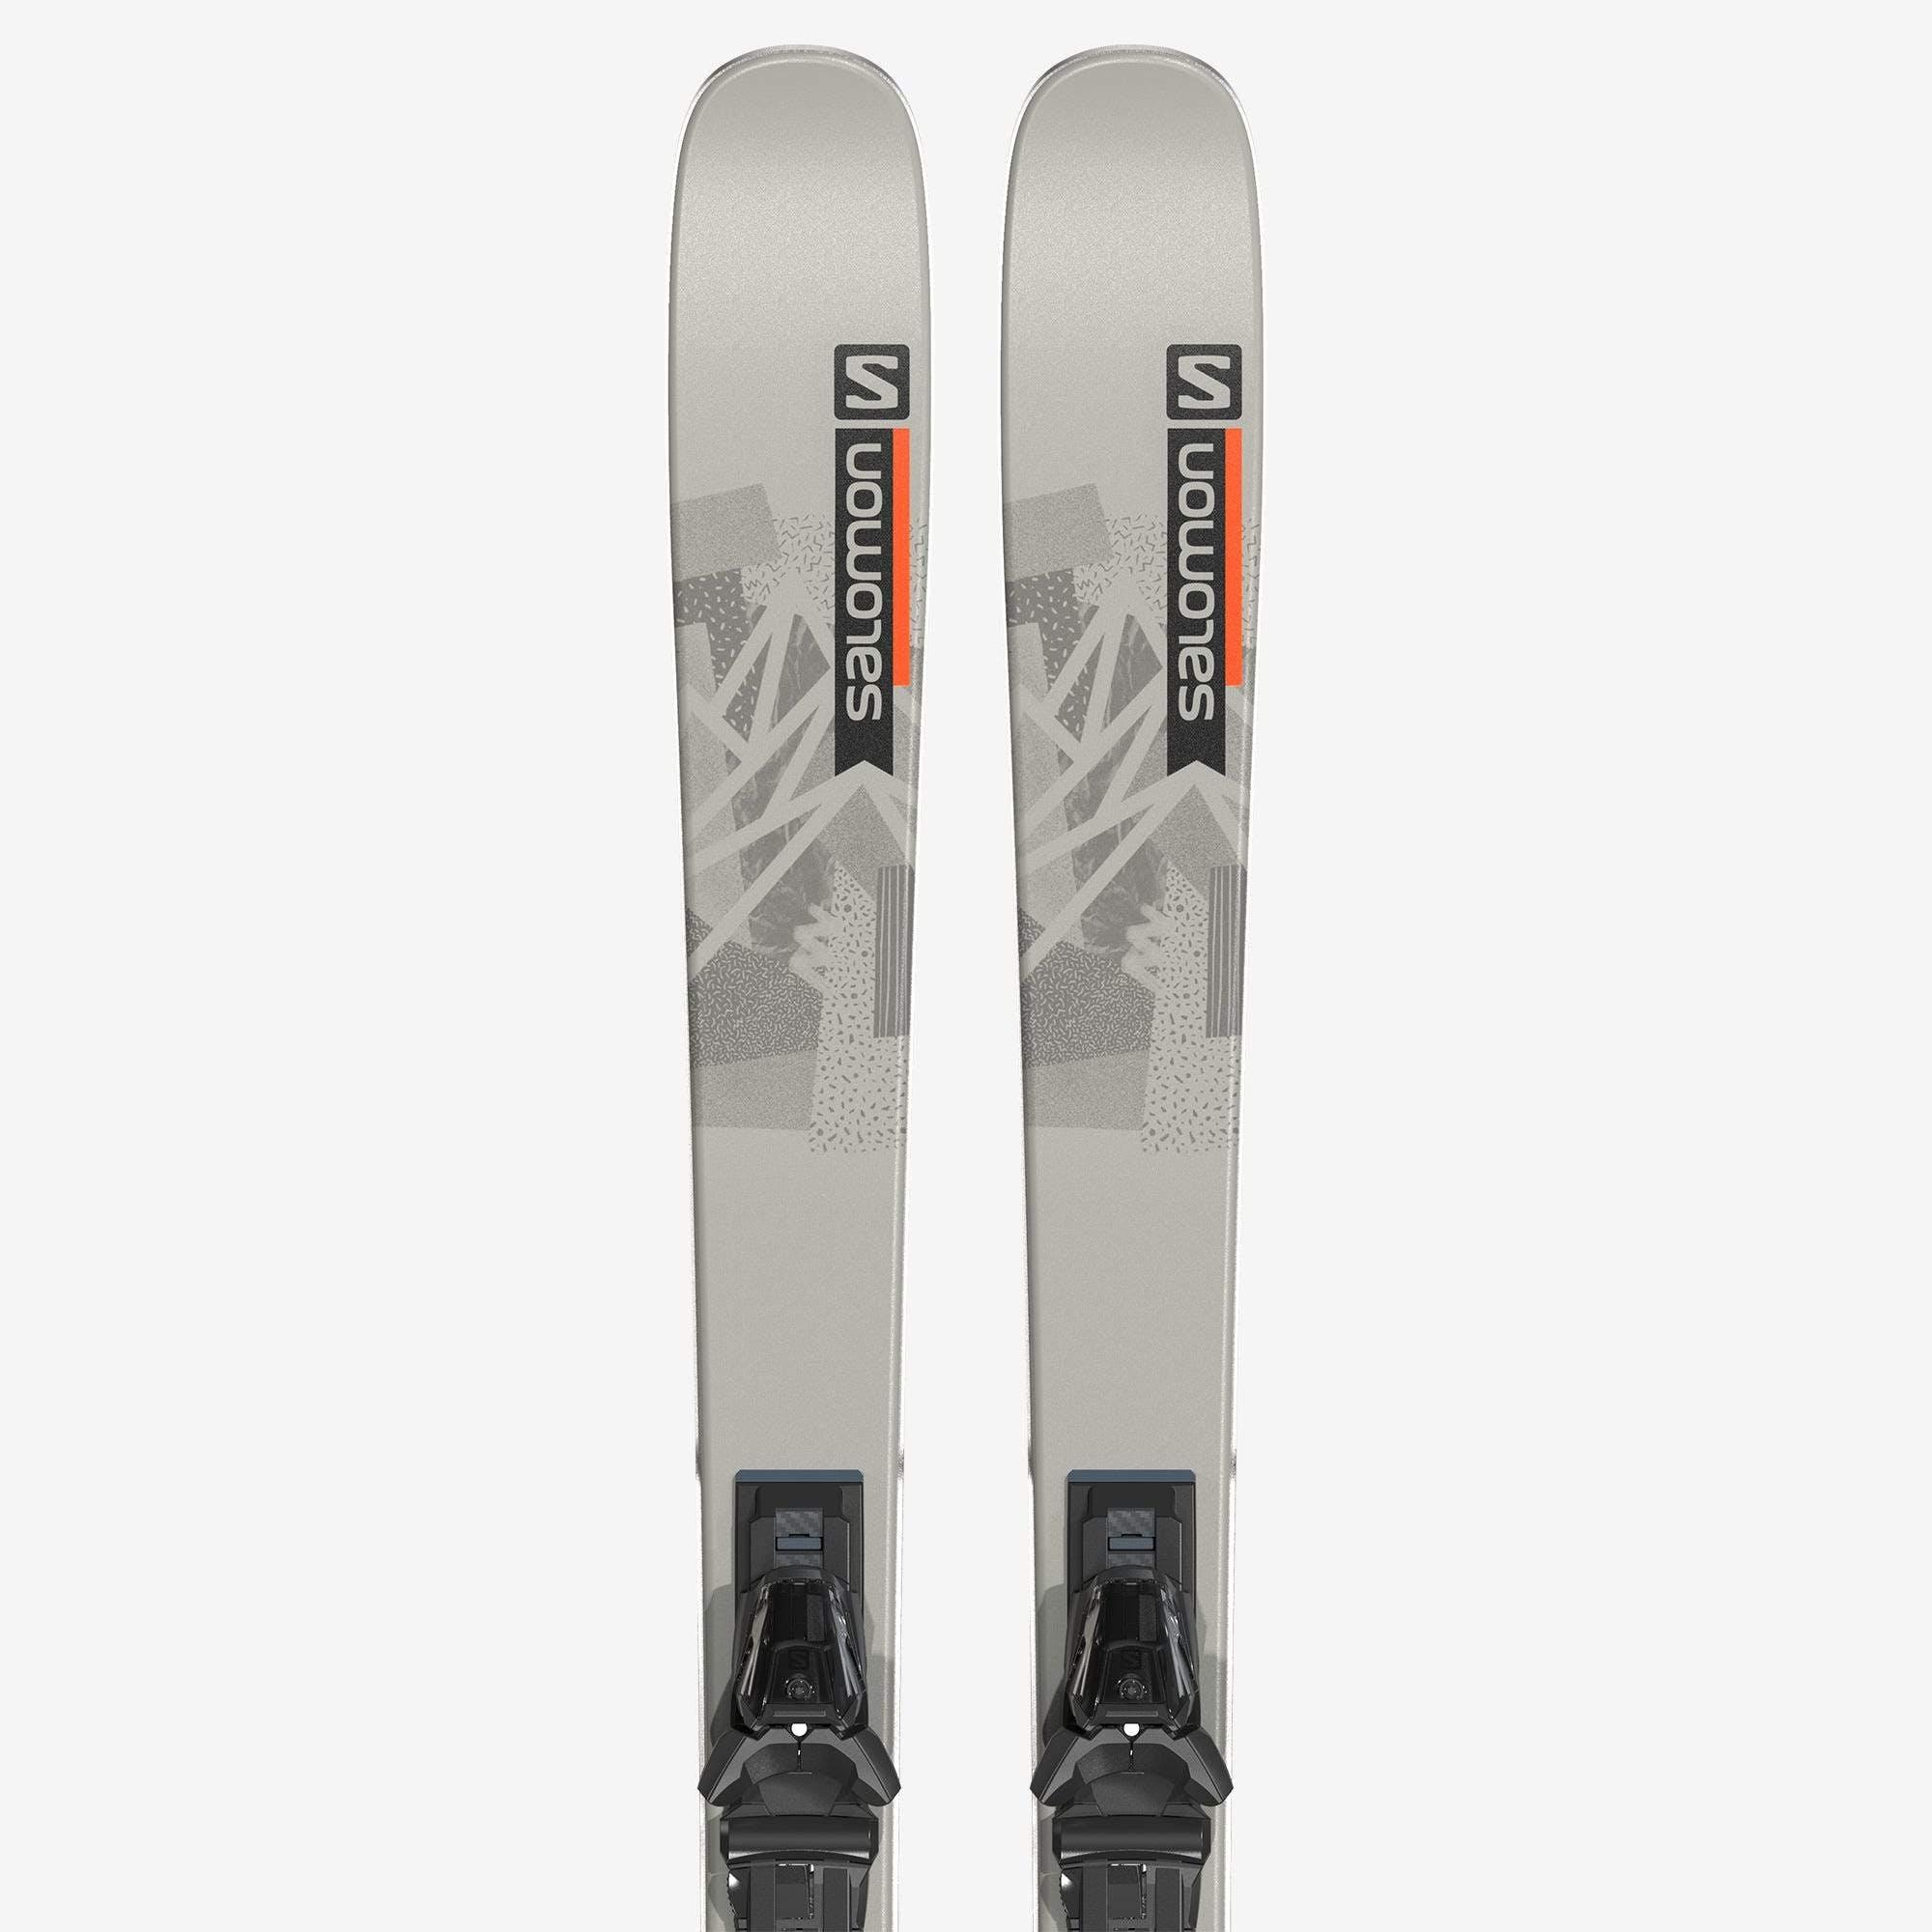 Salomon QST Spark Skis with M10 Gw Bindings · 2022